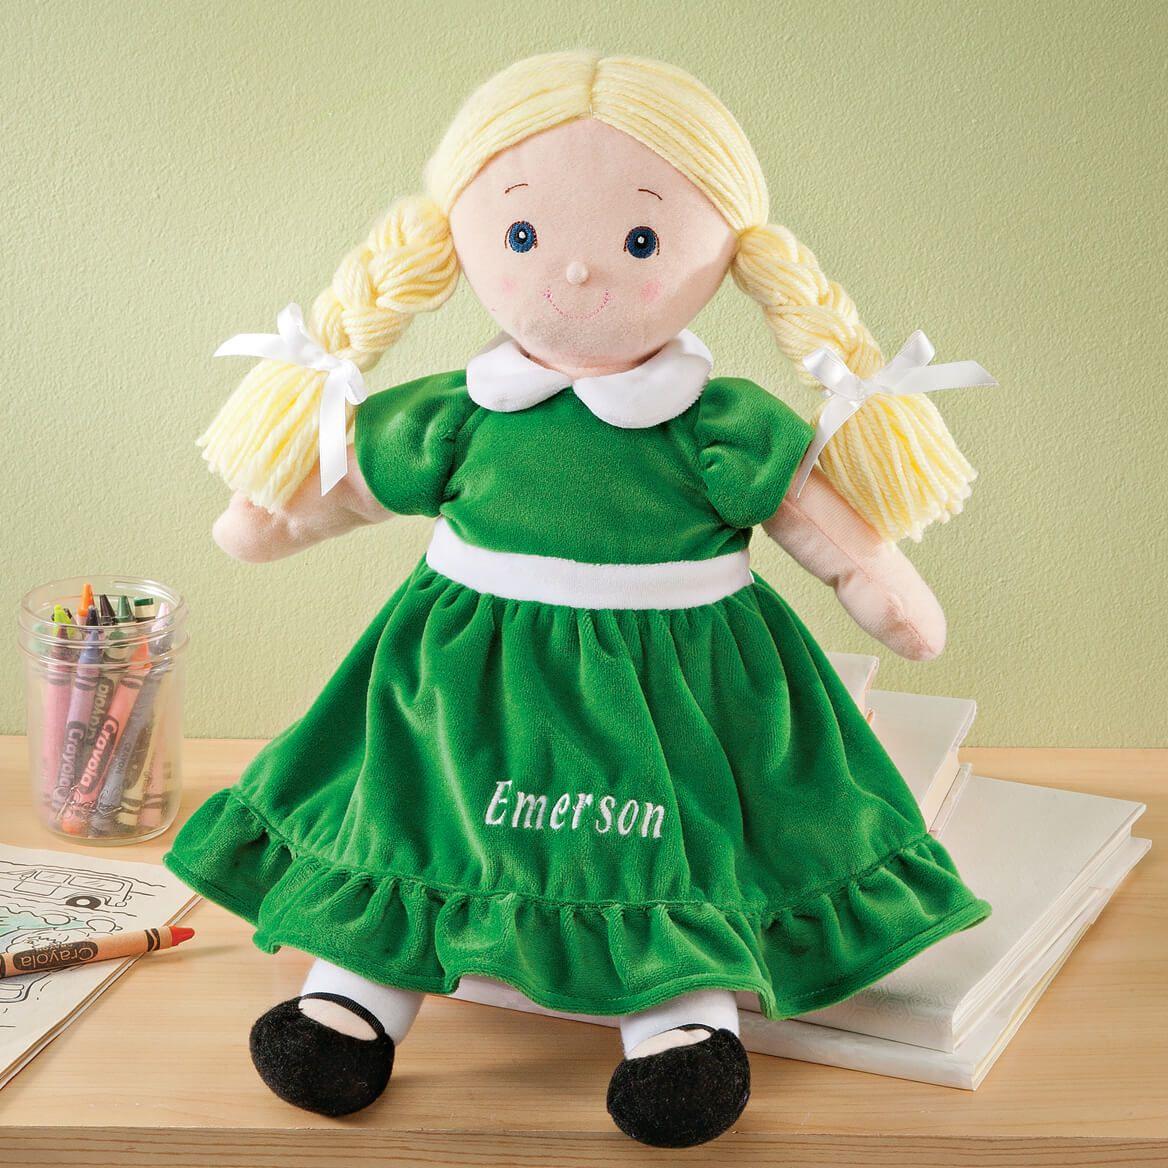 Personalized Big Sister Birthstone Doll-352915